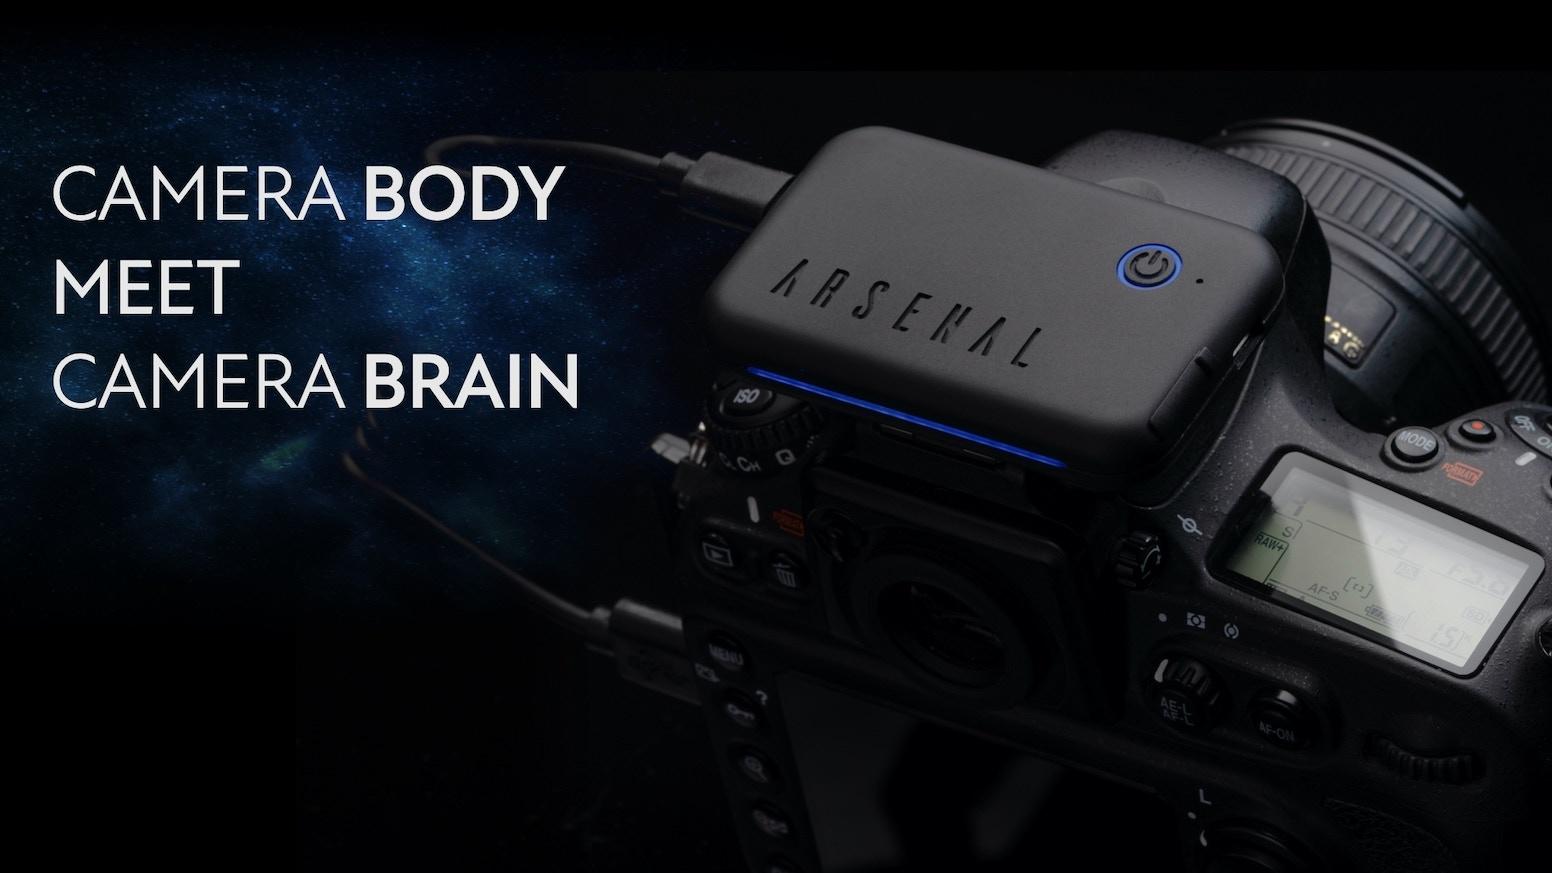 Smarter than ever, Arsenal 2 uses AI to help you take amazing photos.